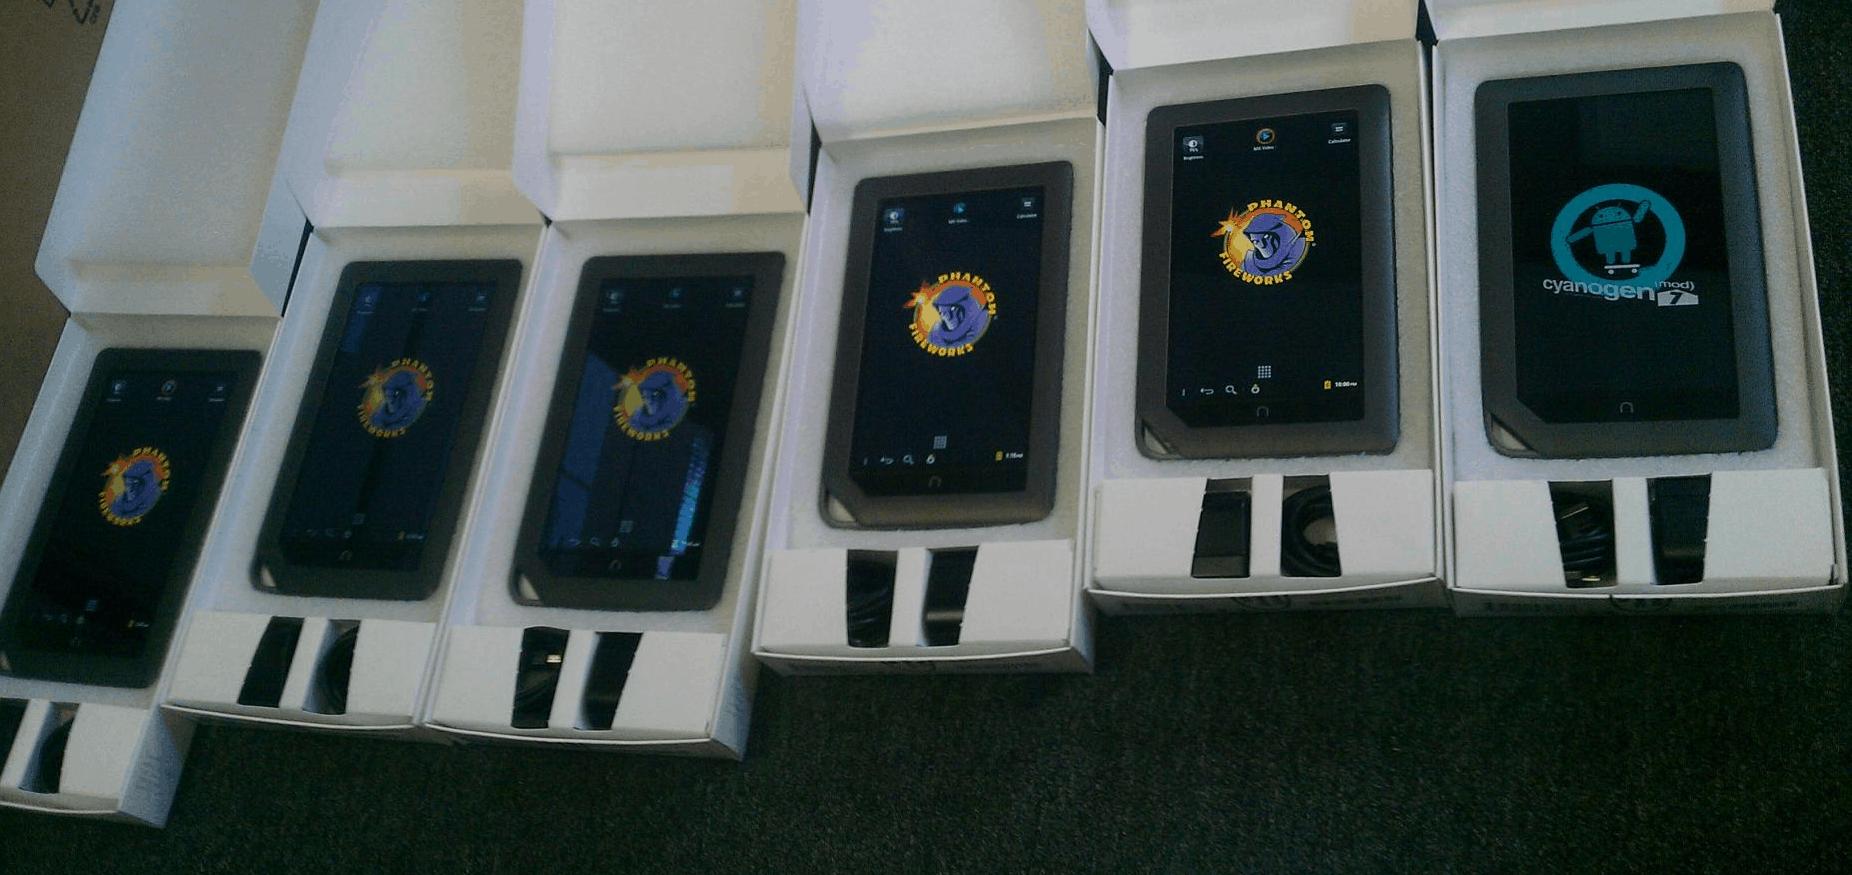 showroom tablet with vidoe